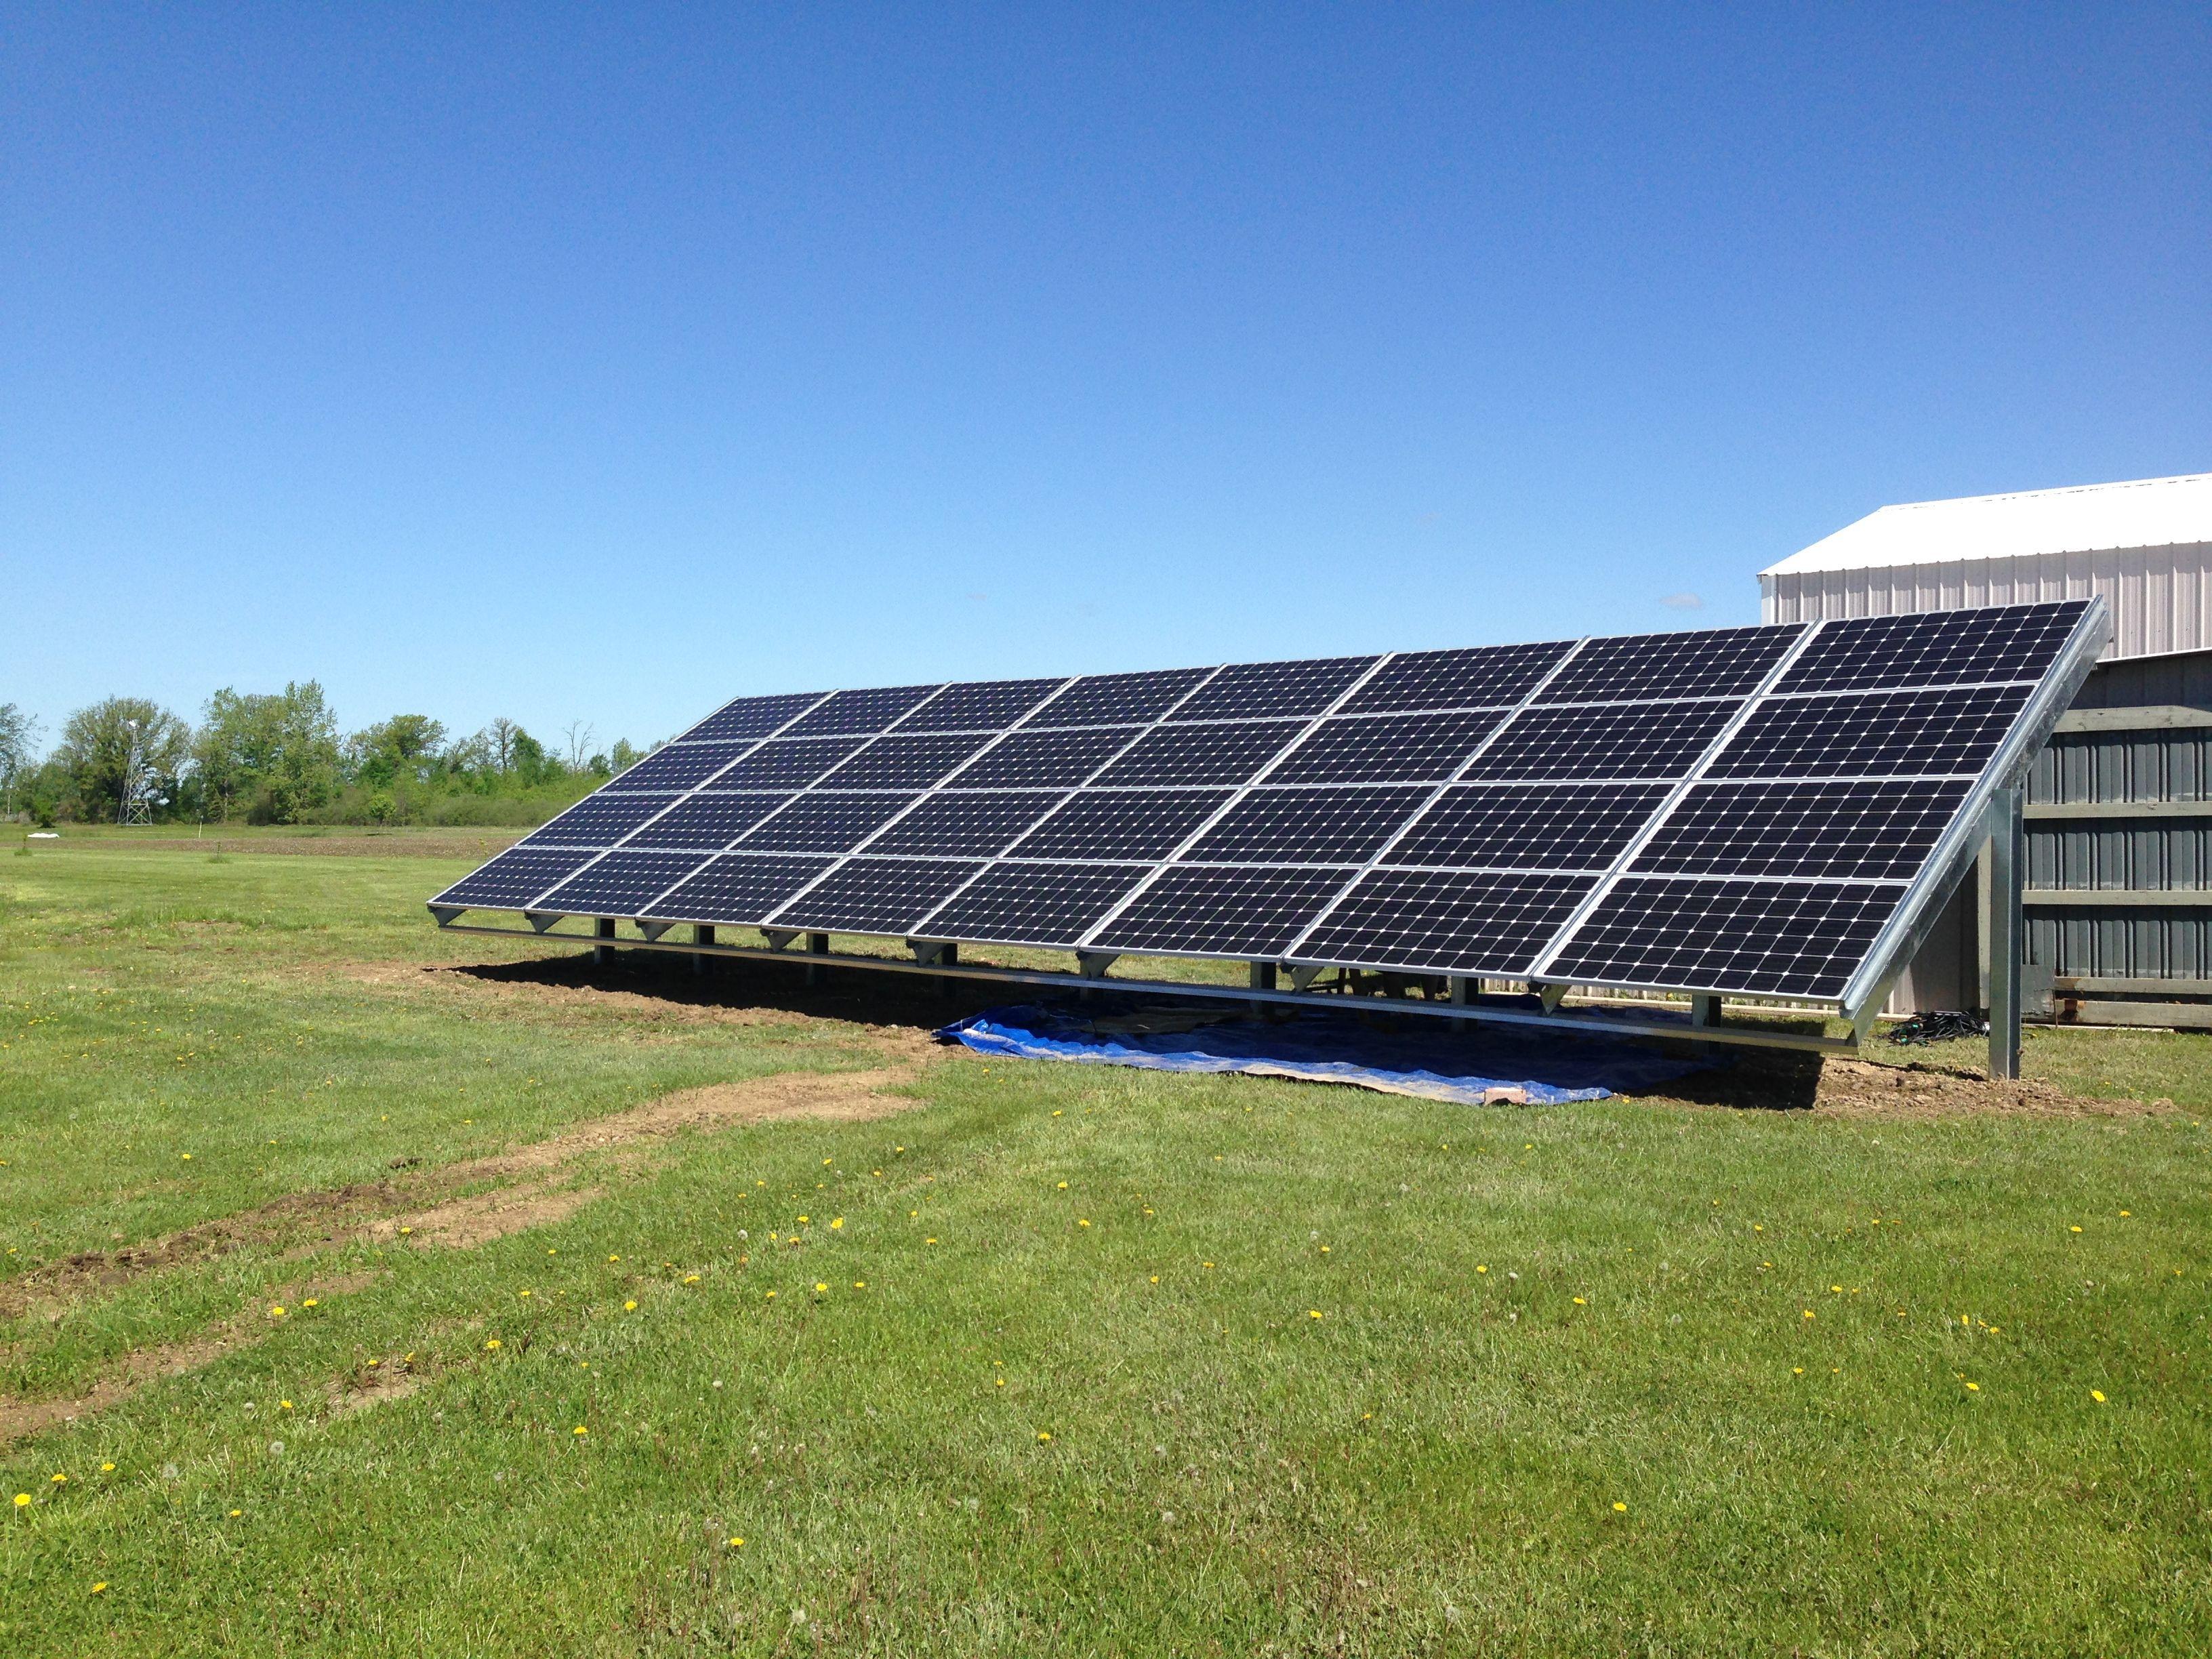 Newport Michigan Ground Mount Solar Array Using Patriot Solar Group S Racking 32 270w Solarworld Panels 32 Solar Panels Design Solar Solar Panel Battery